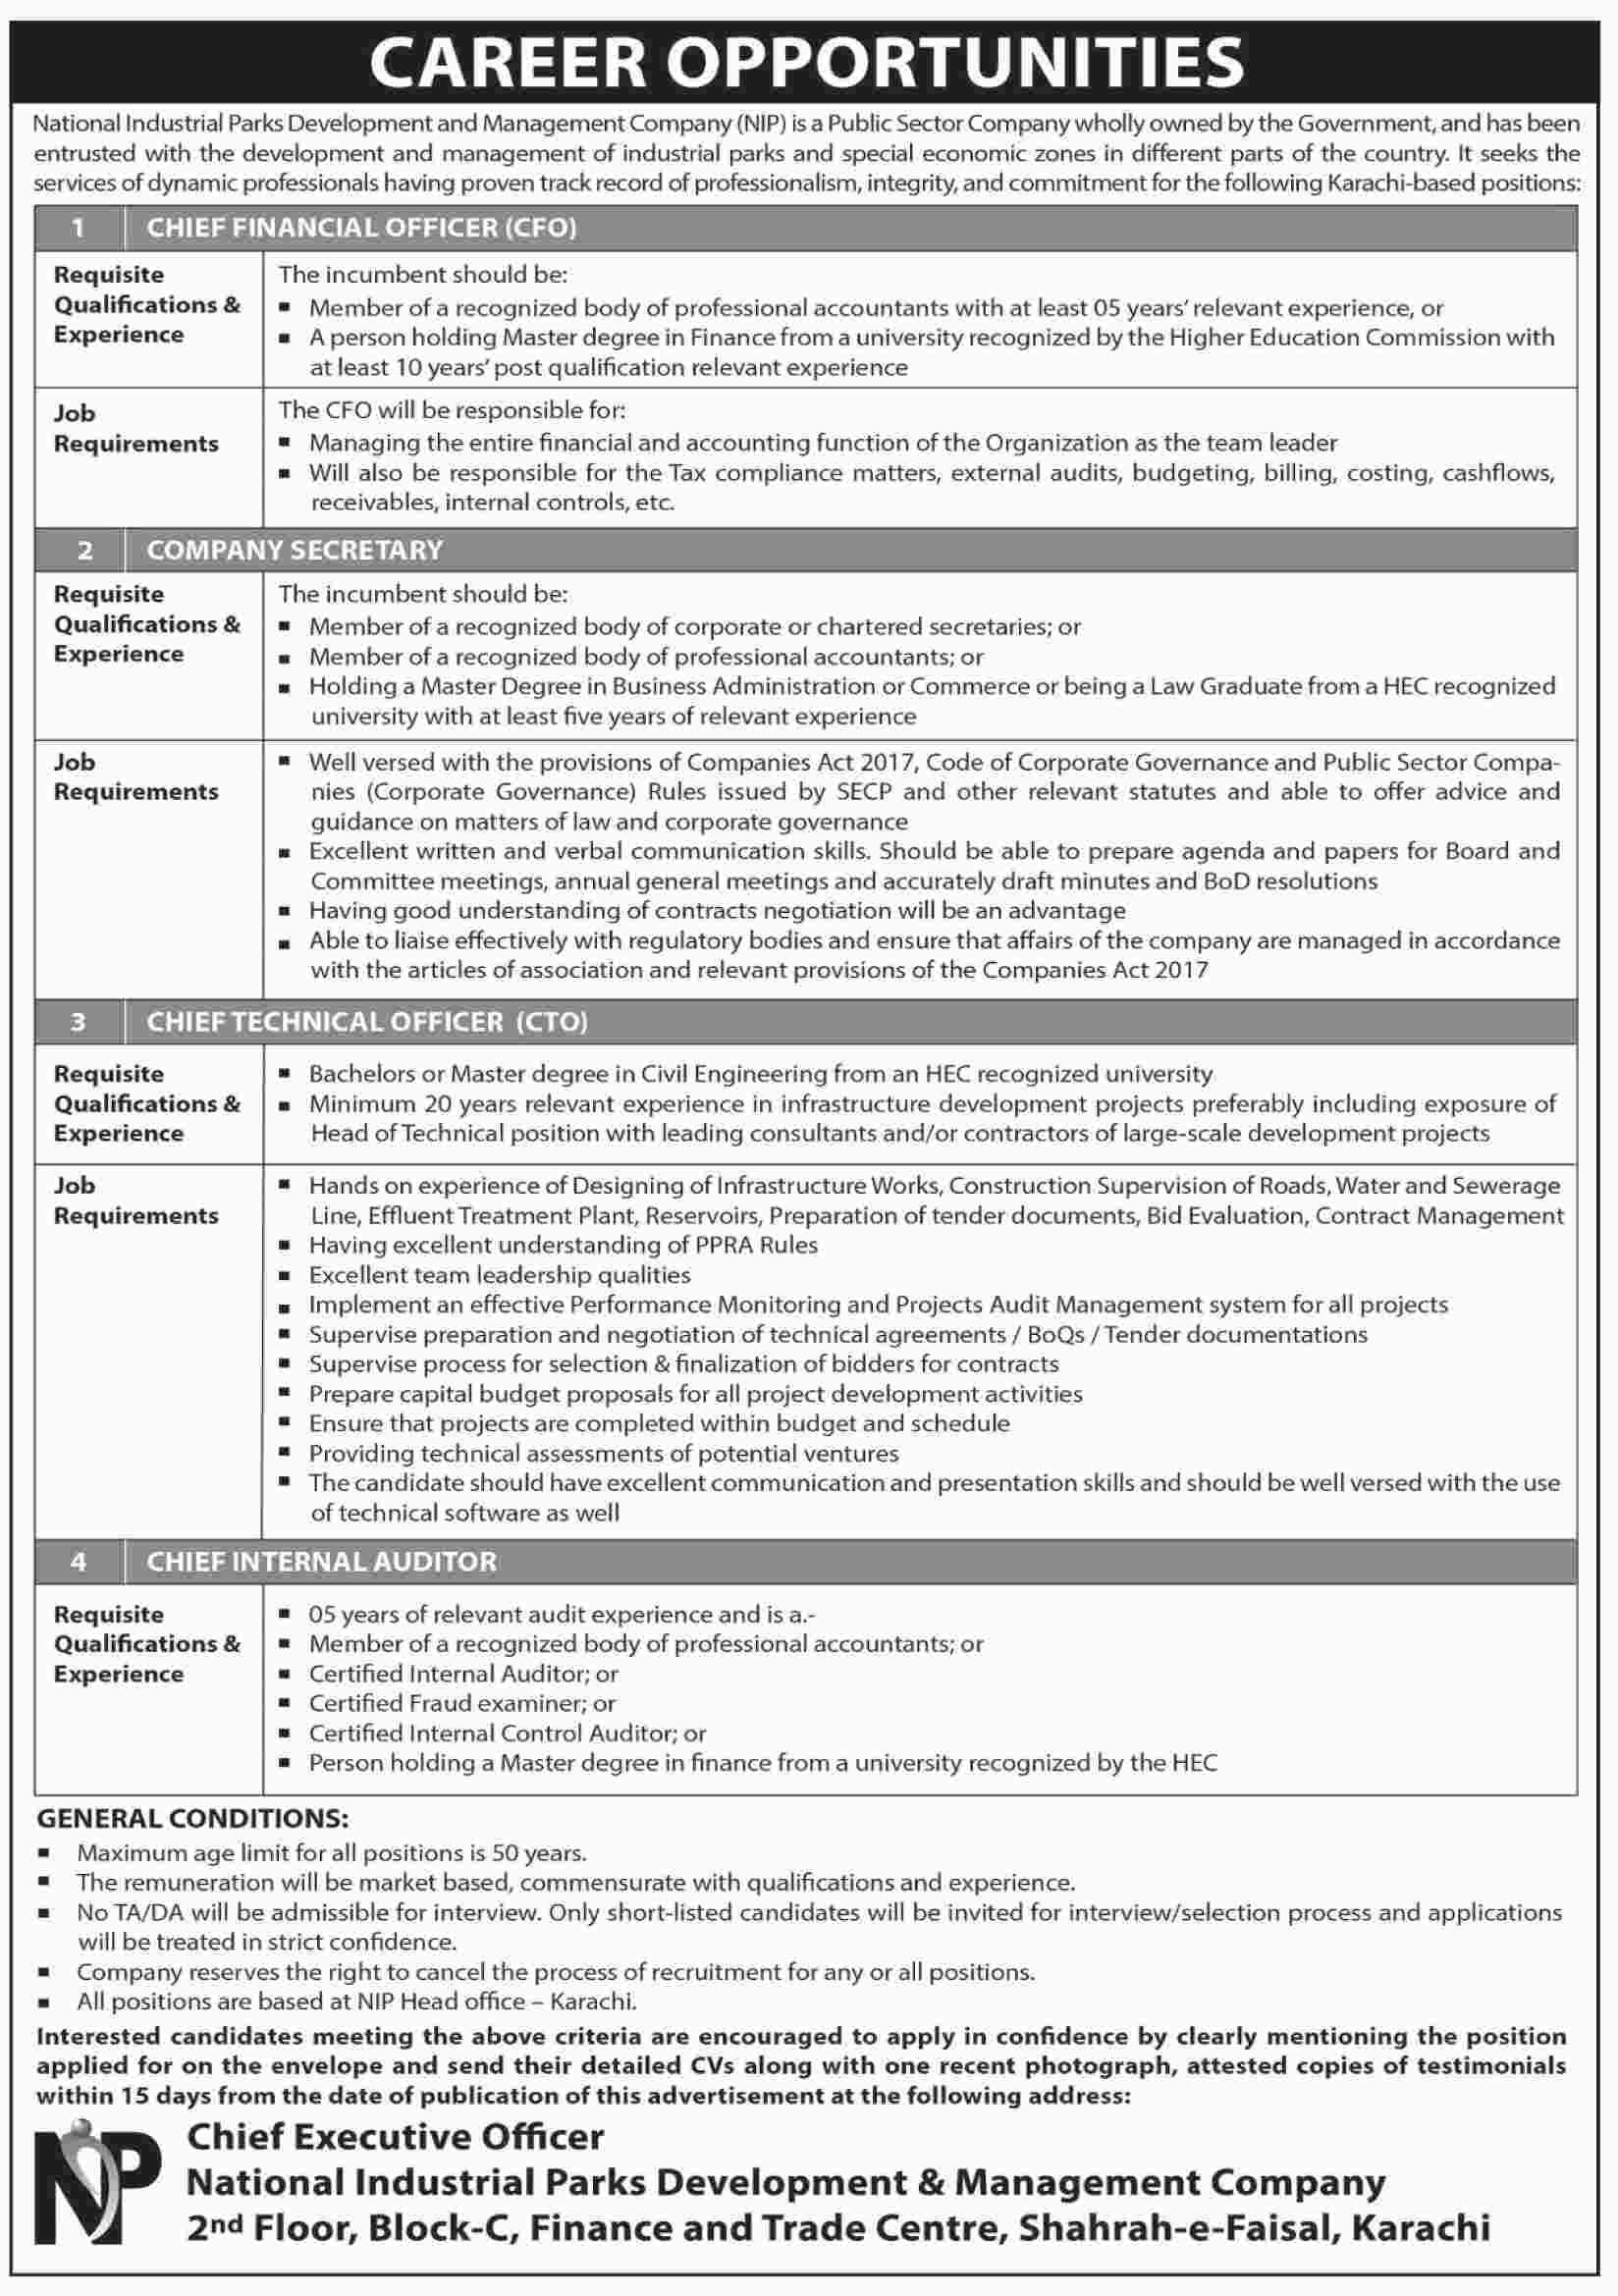 national industrial parks development  u0026 management jobs